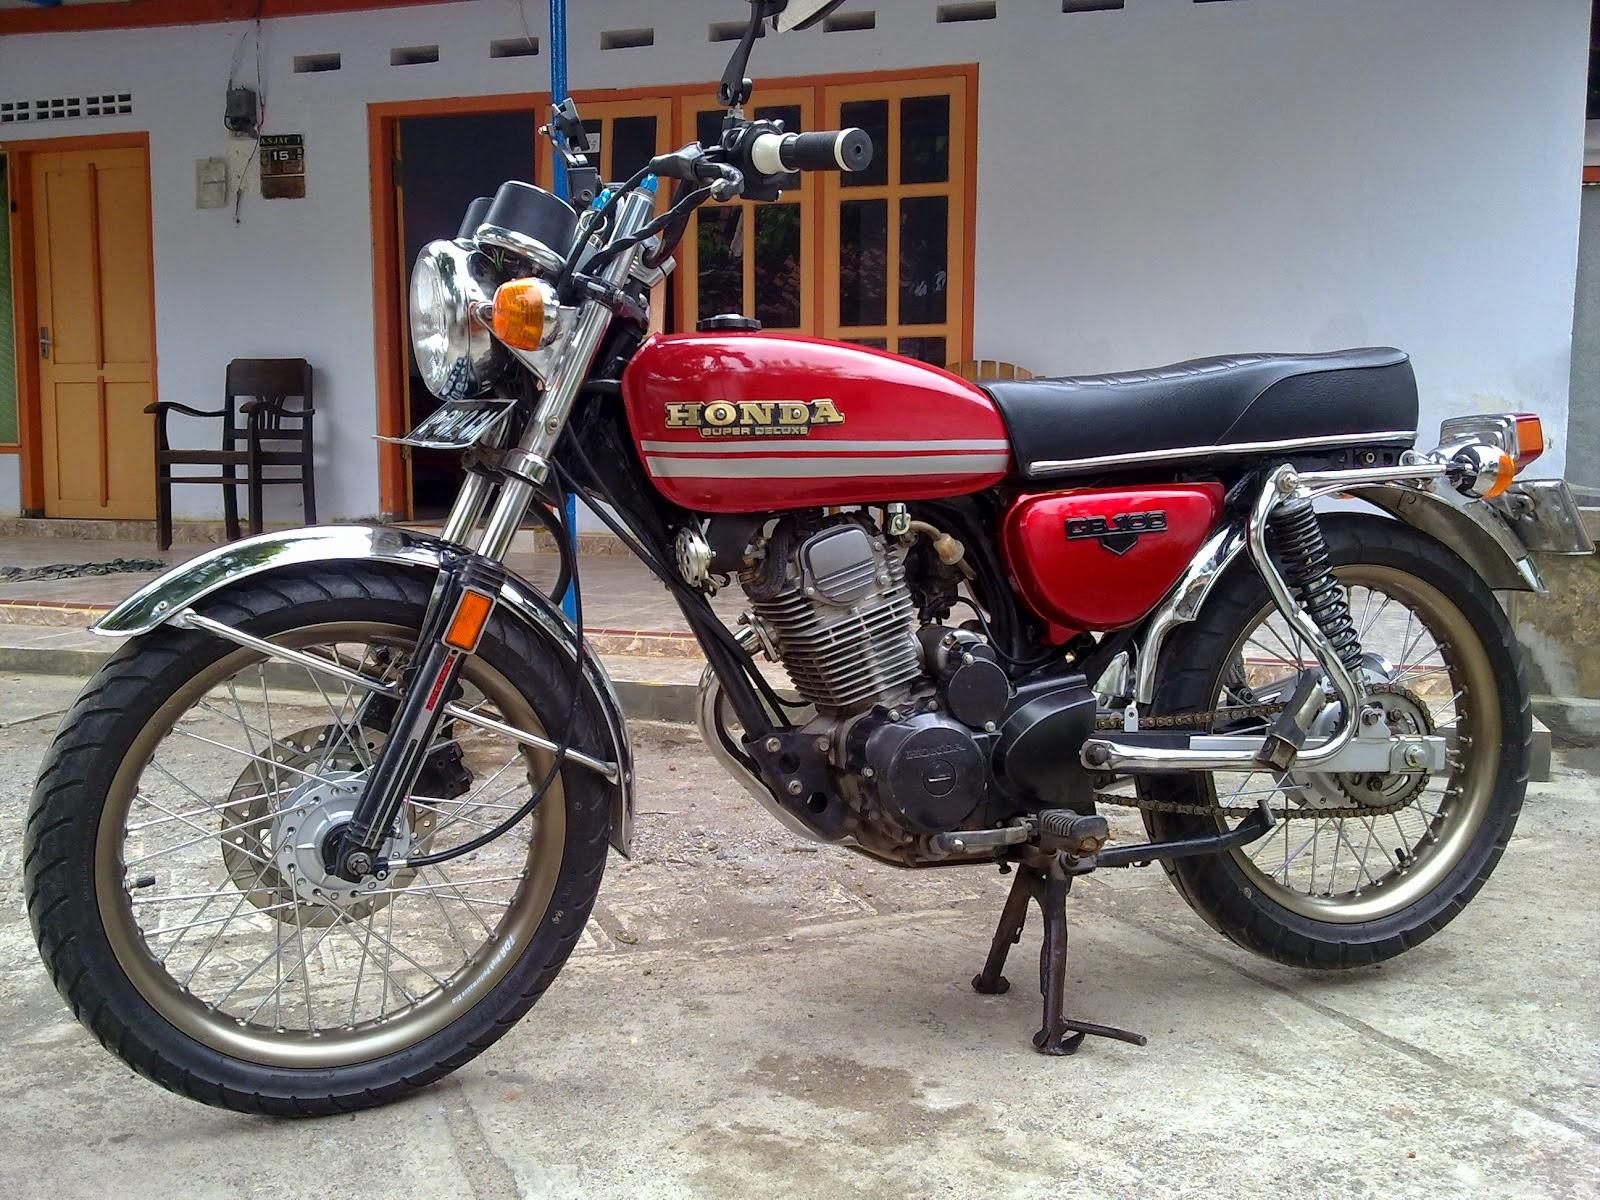 102 Modifikasi Motor Gl Max Cb Modifikasi Motor Honda CB Terbaru